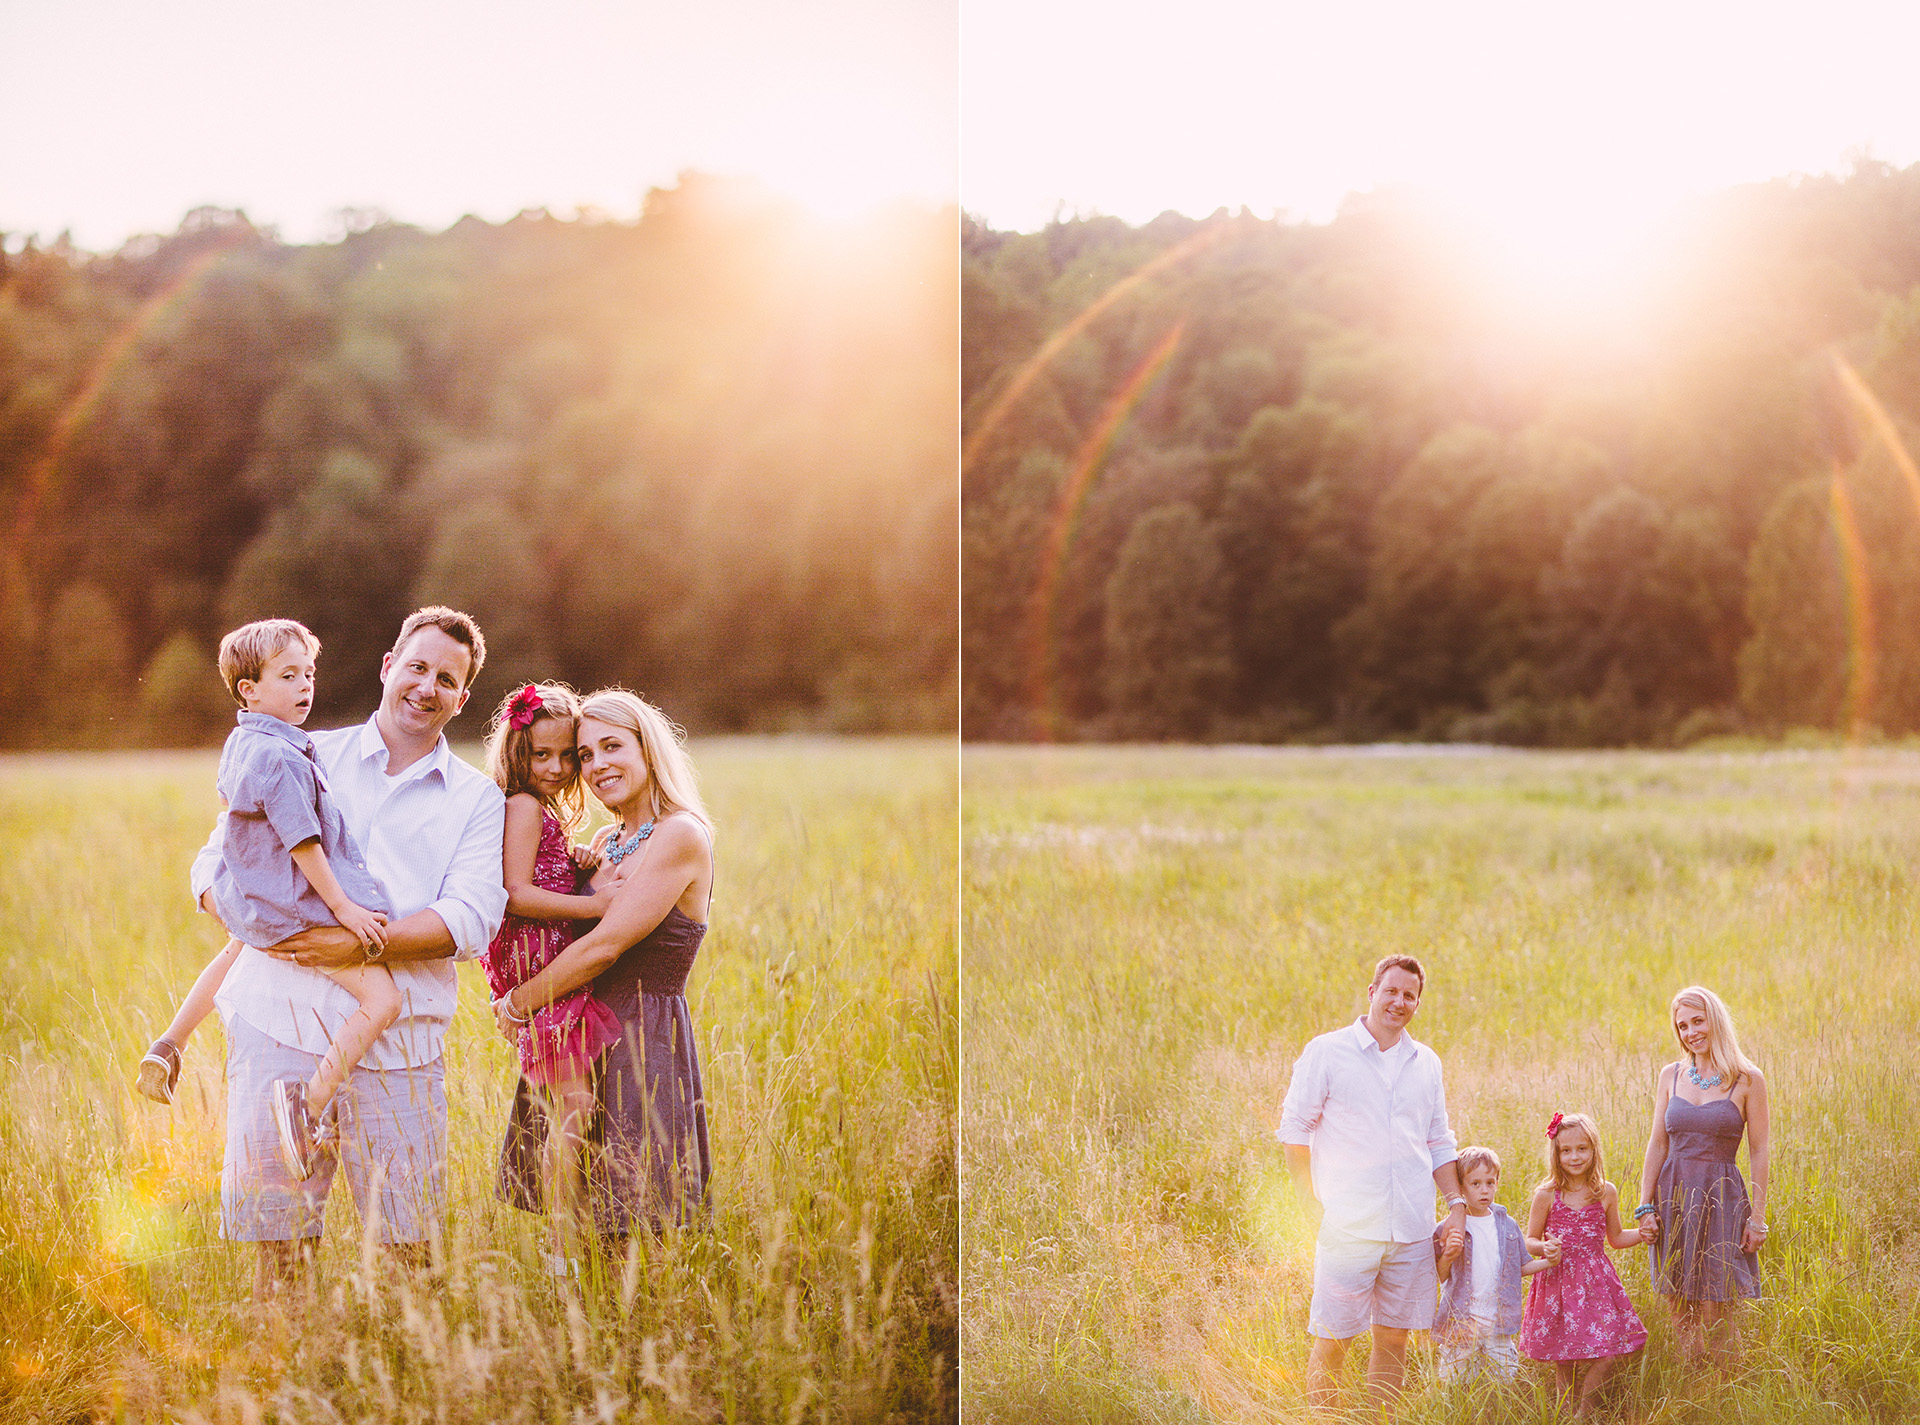 Cleveland Lifestyle Family Portrait Photographer 18.jpg